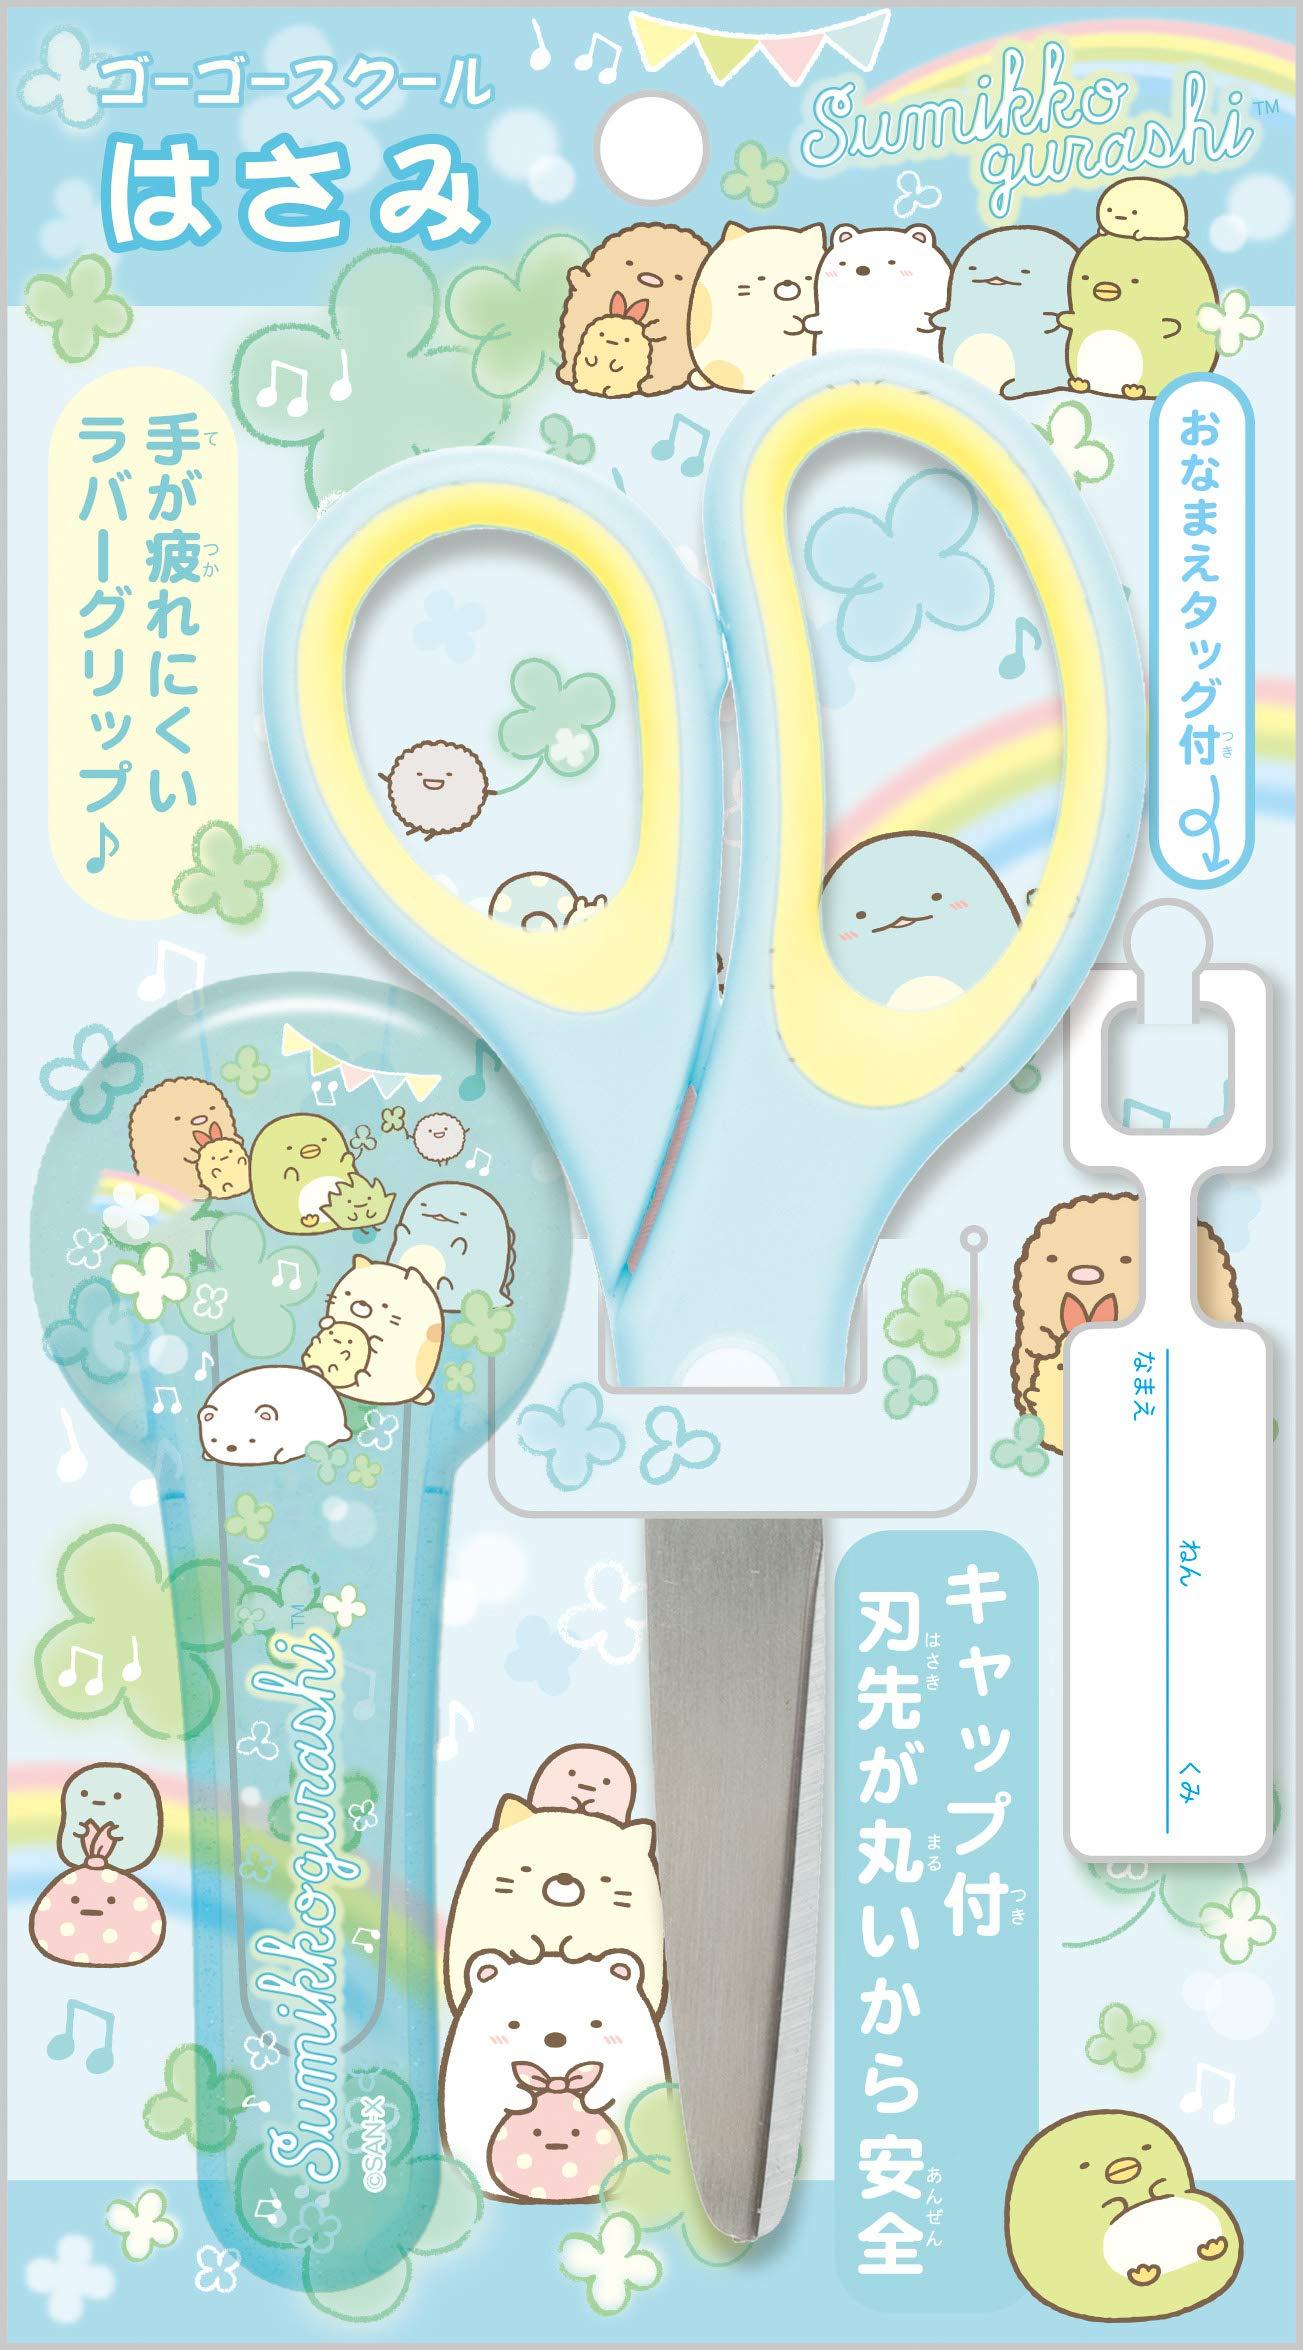 San-X Sumikko Gurashi Scissors MS21201, Go Go School by San-X